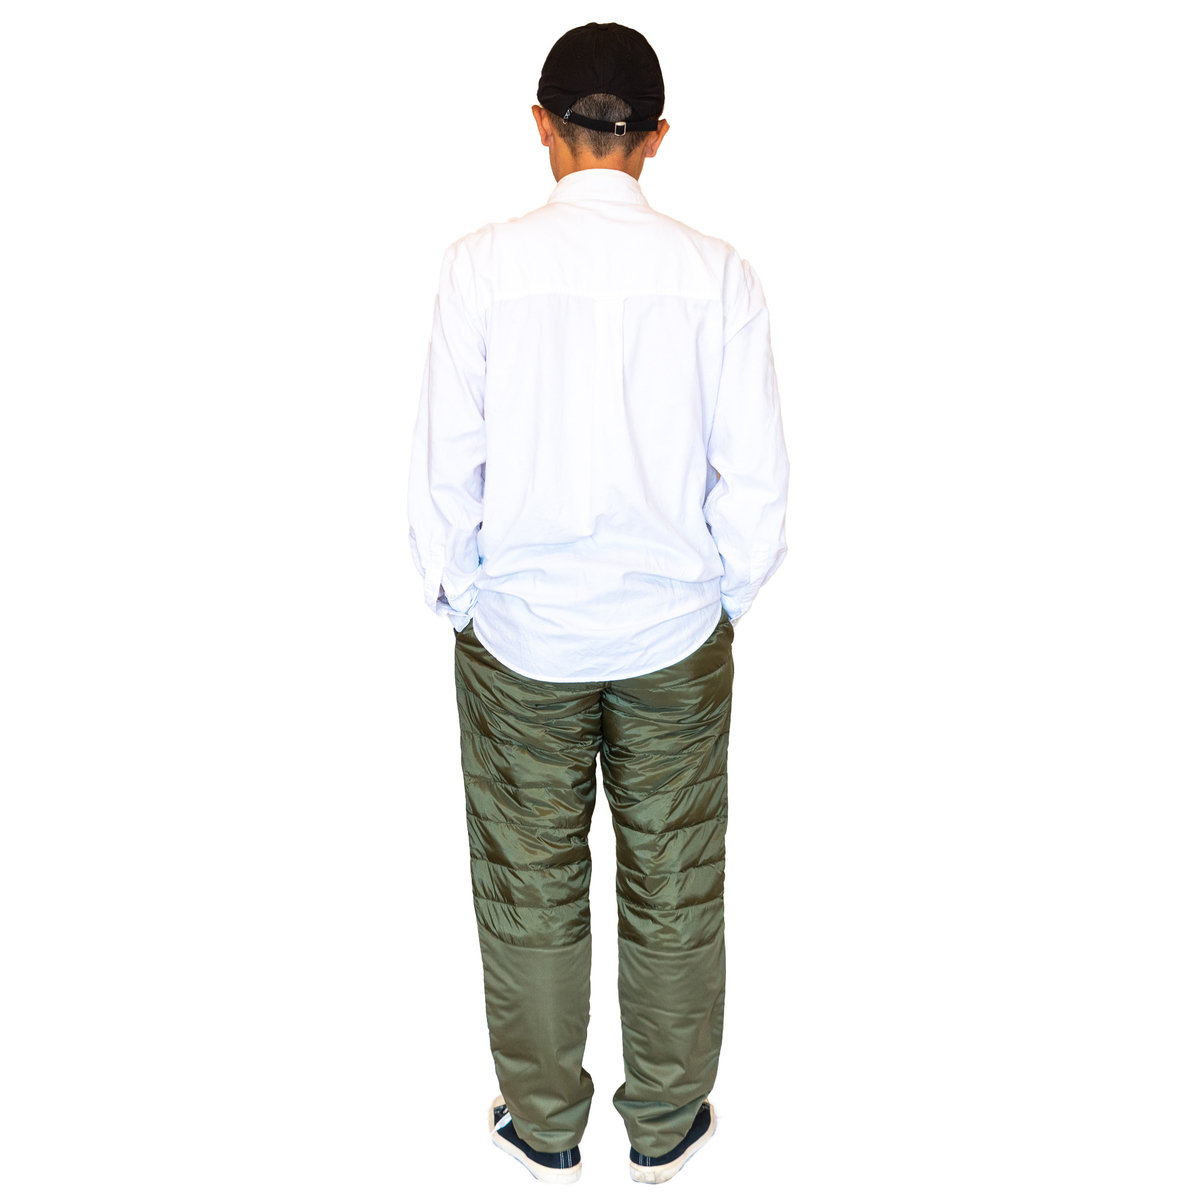 f:id:yamada0221:20210816113043j:plain